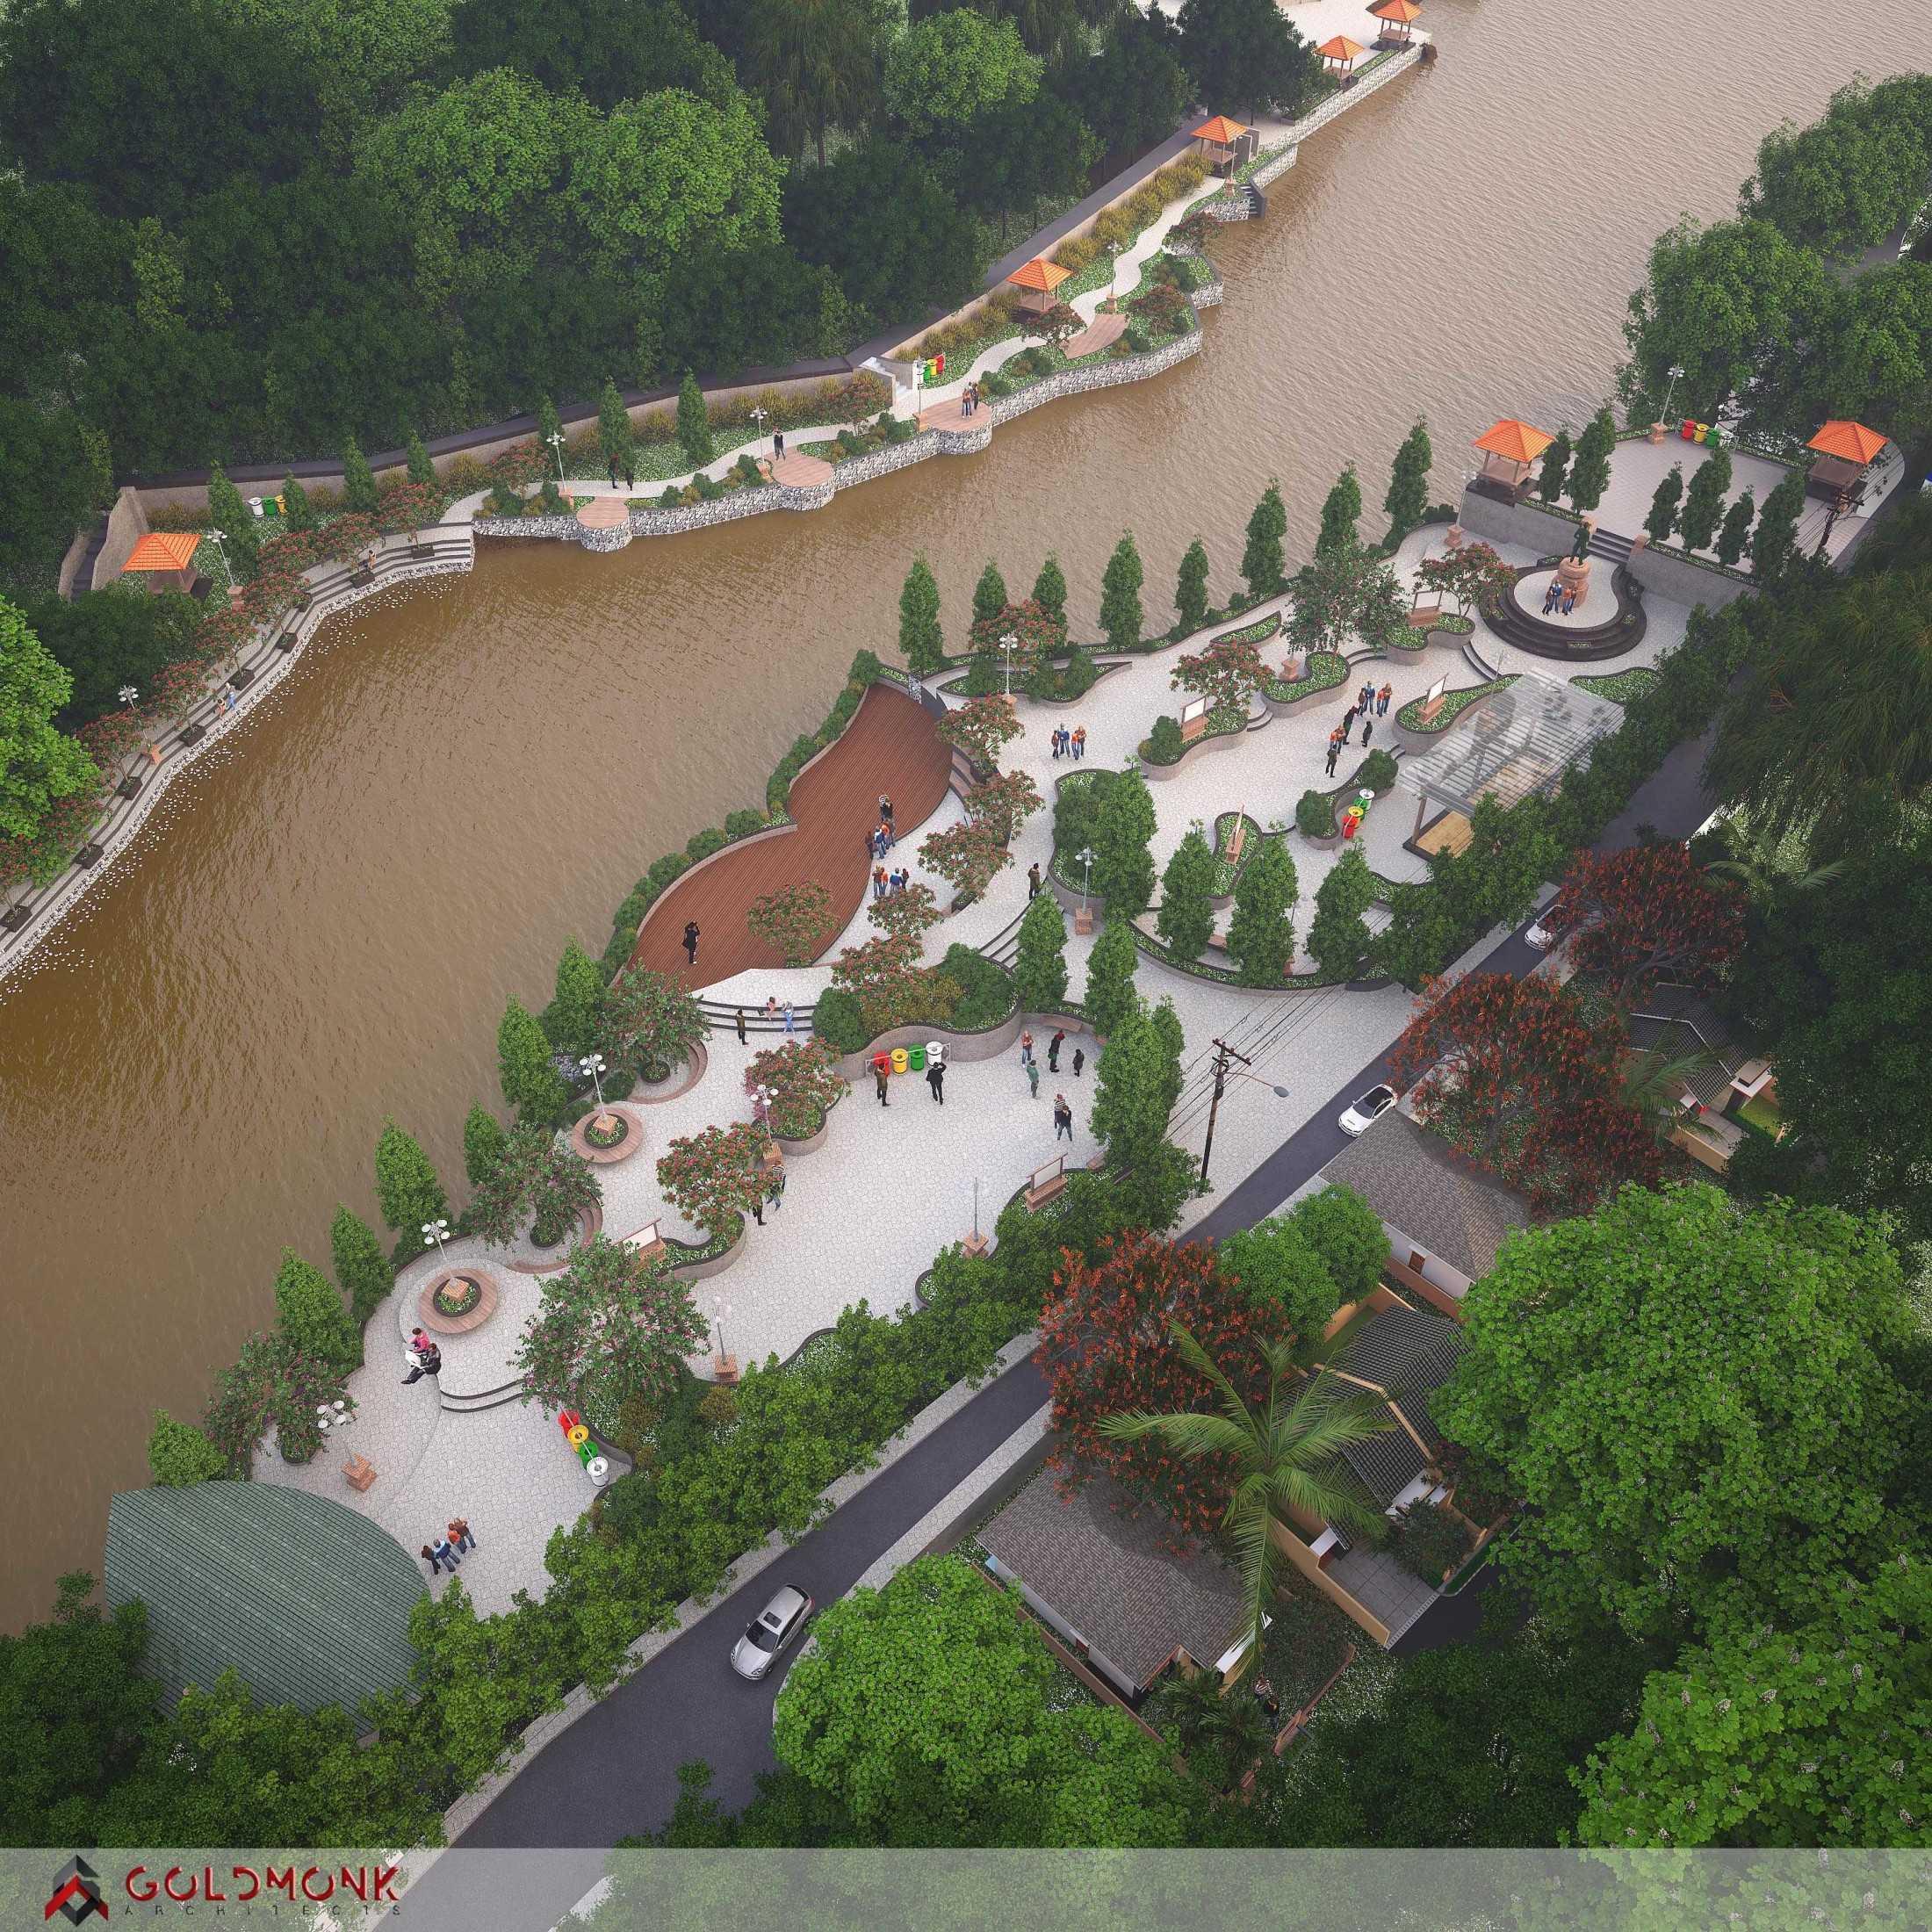 "Goldmonk Architects Penataan Alur Sungai ""tukad Oongan"" Kota Denpasar, Bali, Indonesia Kota Denpasar, Bali, Indonesia Goldmonk-Architects-Penataan-Alur-Sungai-Tukad-Oongan Tropical 60332"